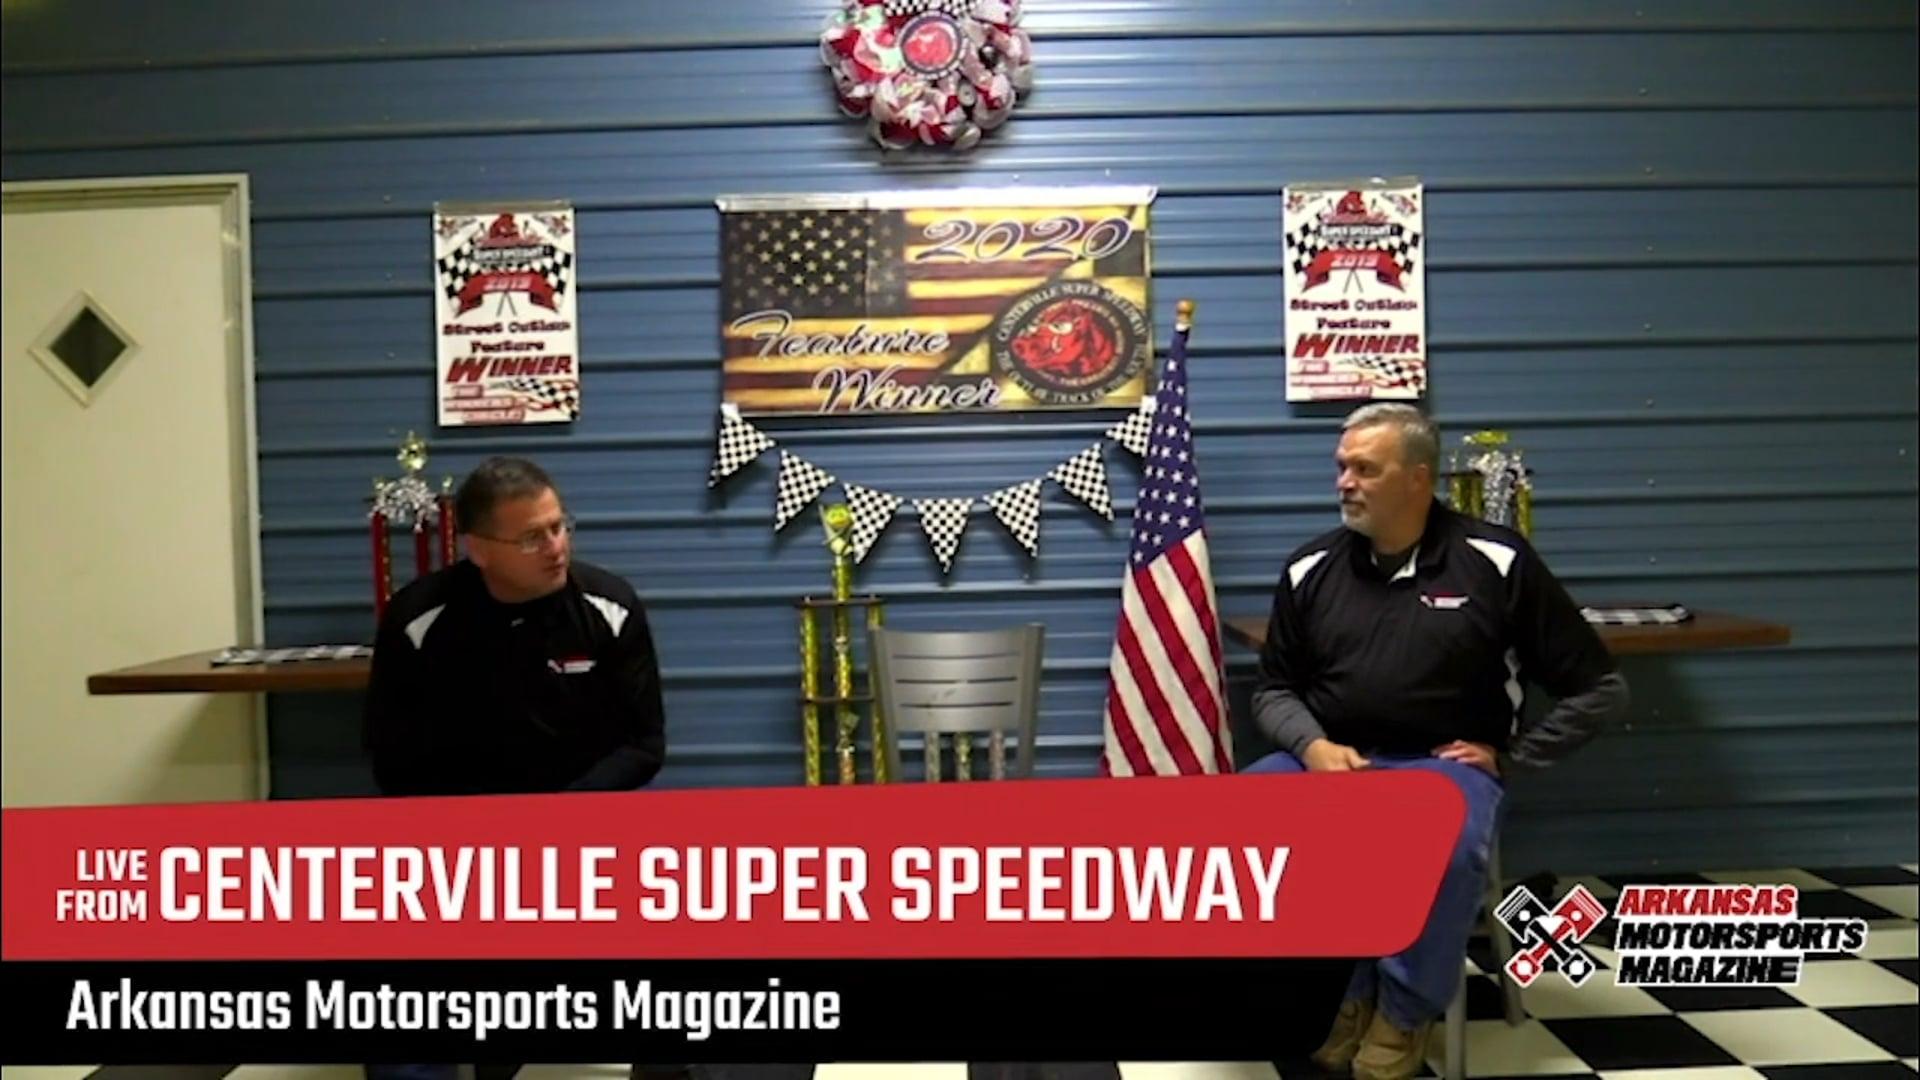 TUESDAY NIGHT TUNE UP - S1 E4 -  Centerville Super Speedway